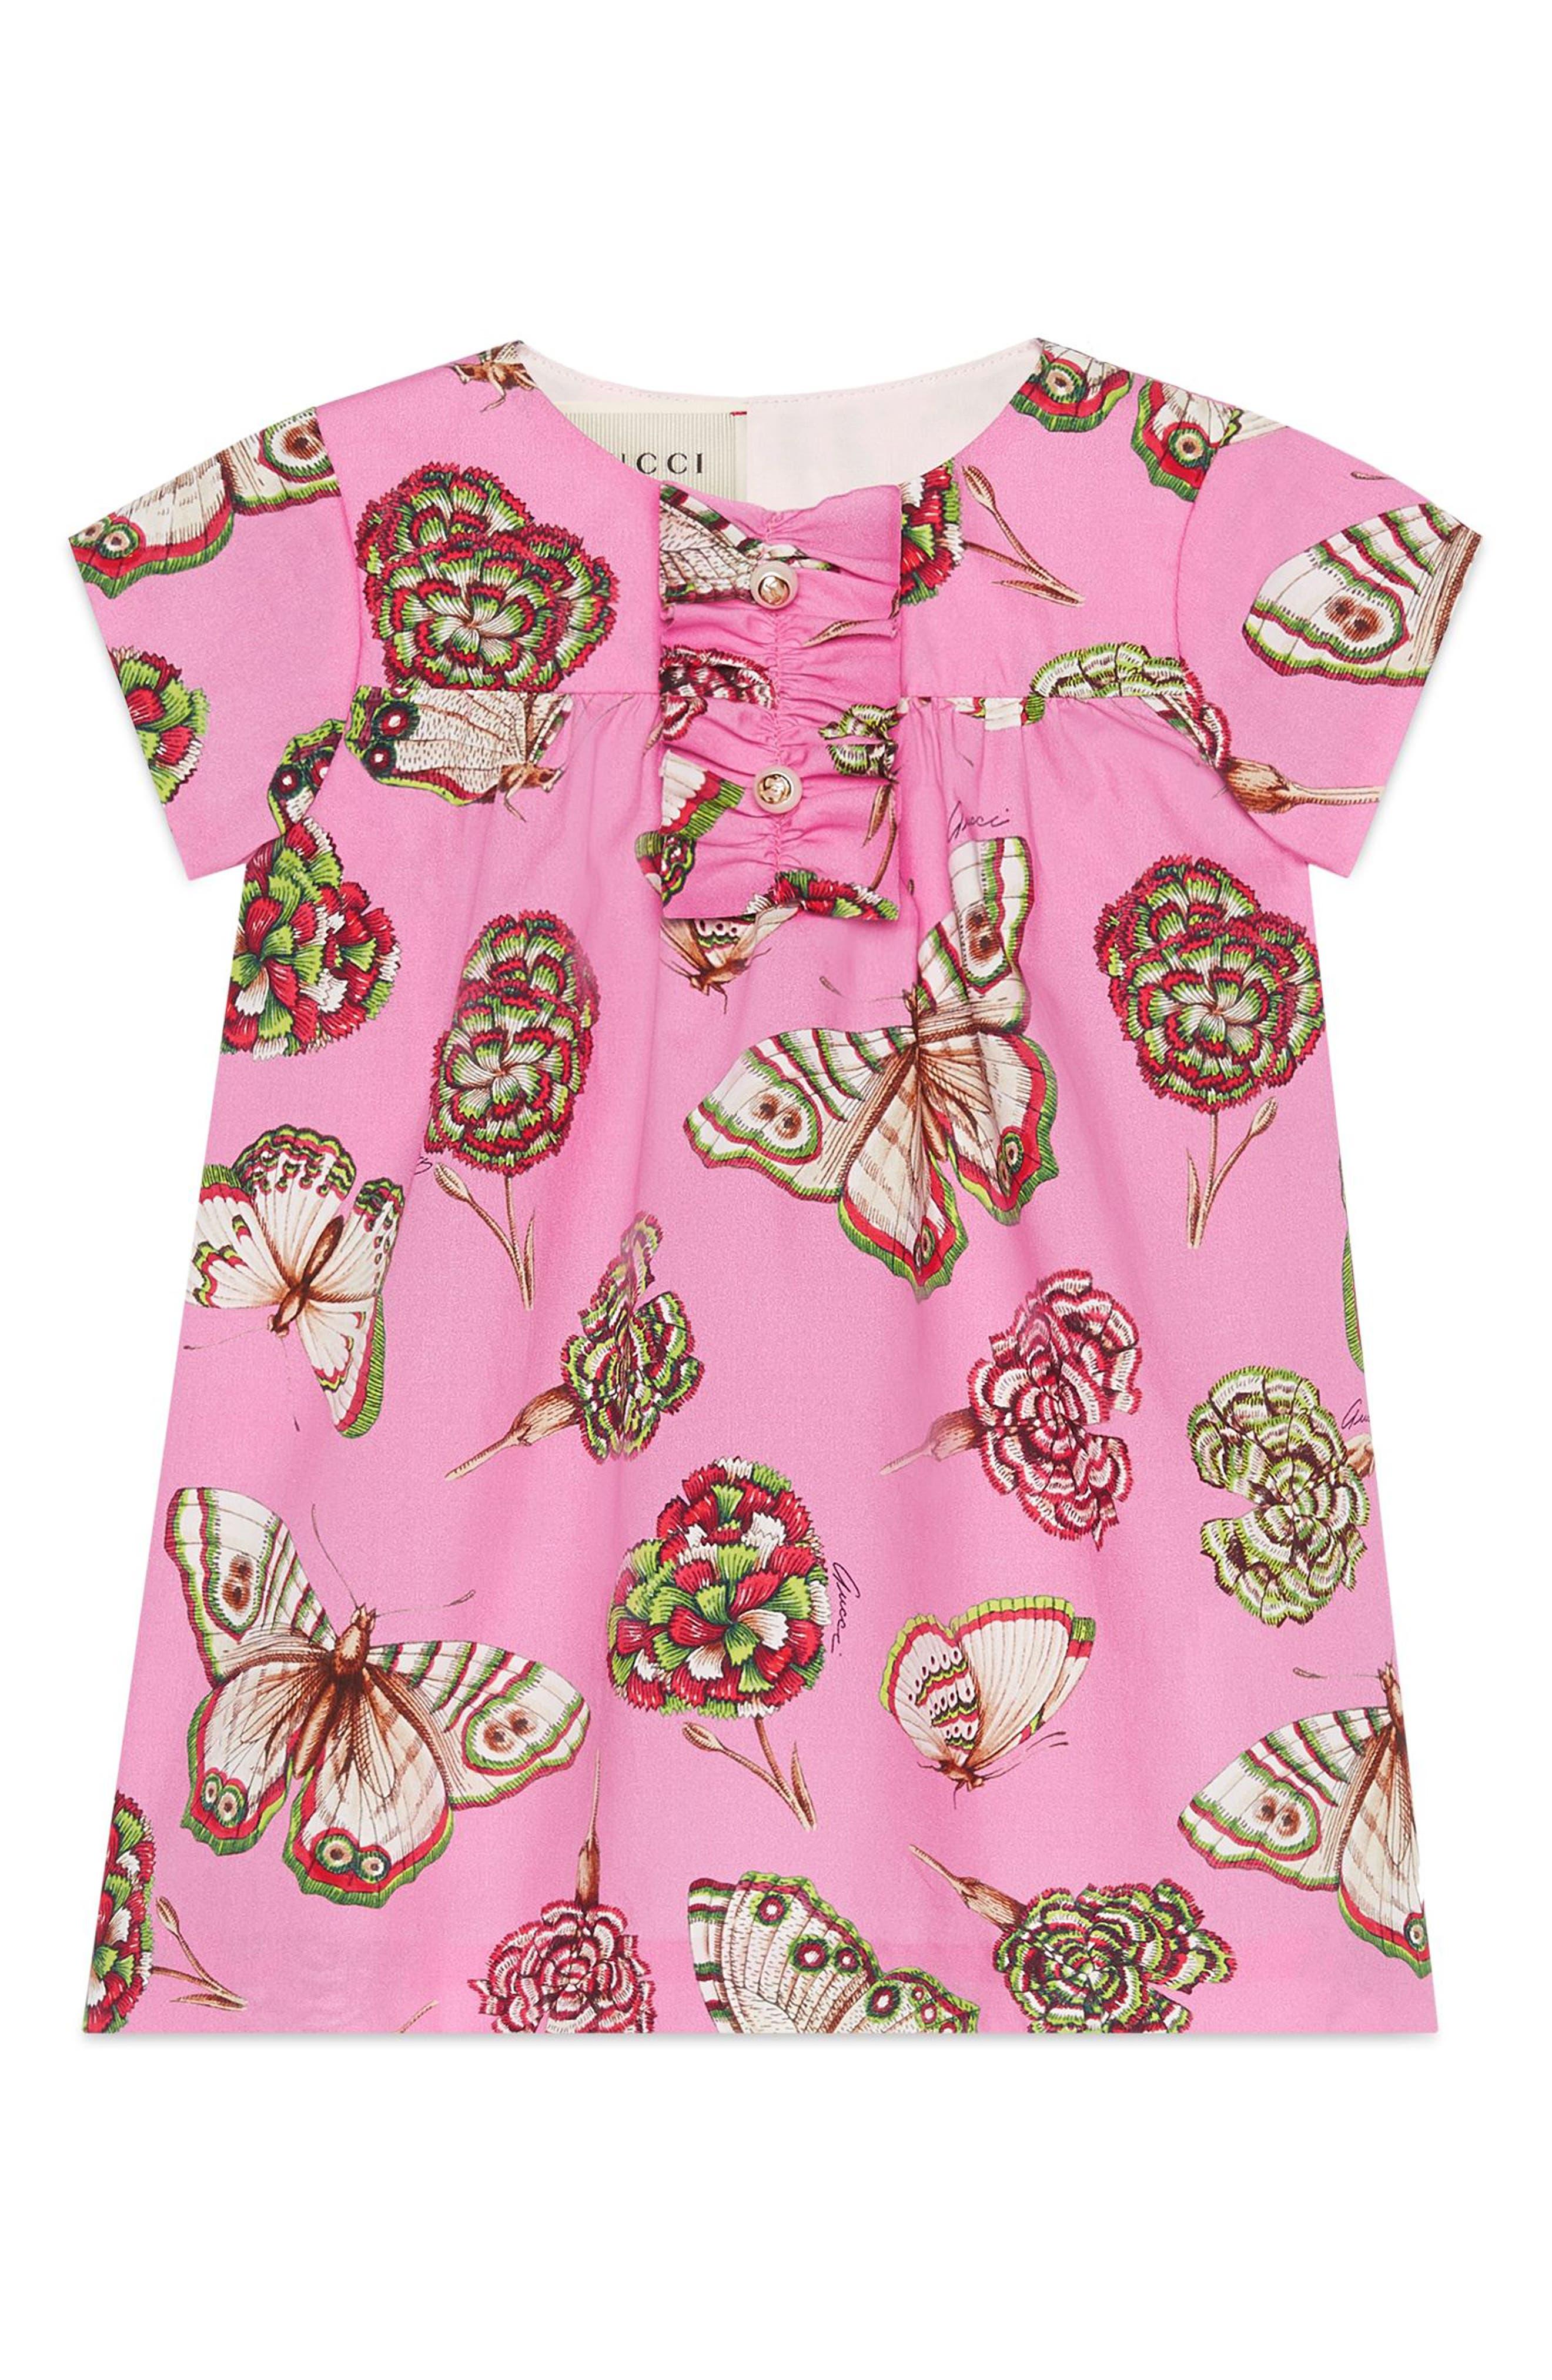 Gucci Butterfly Cotton Poplin Dress (Baby Girls)